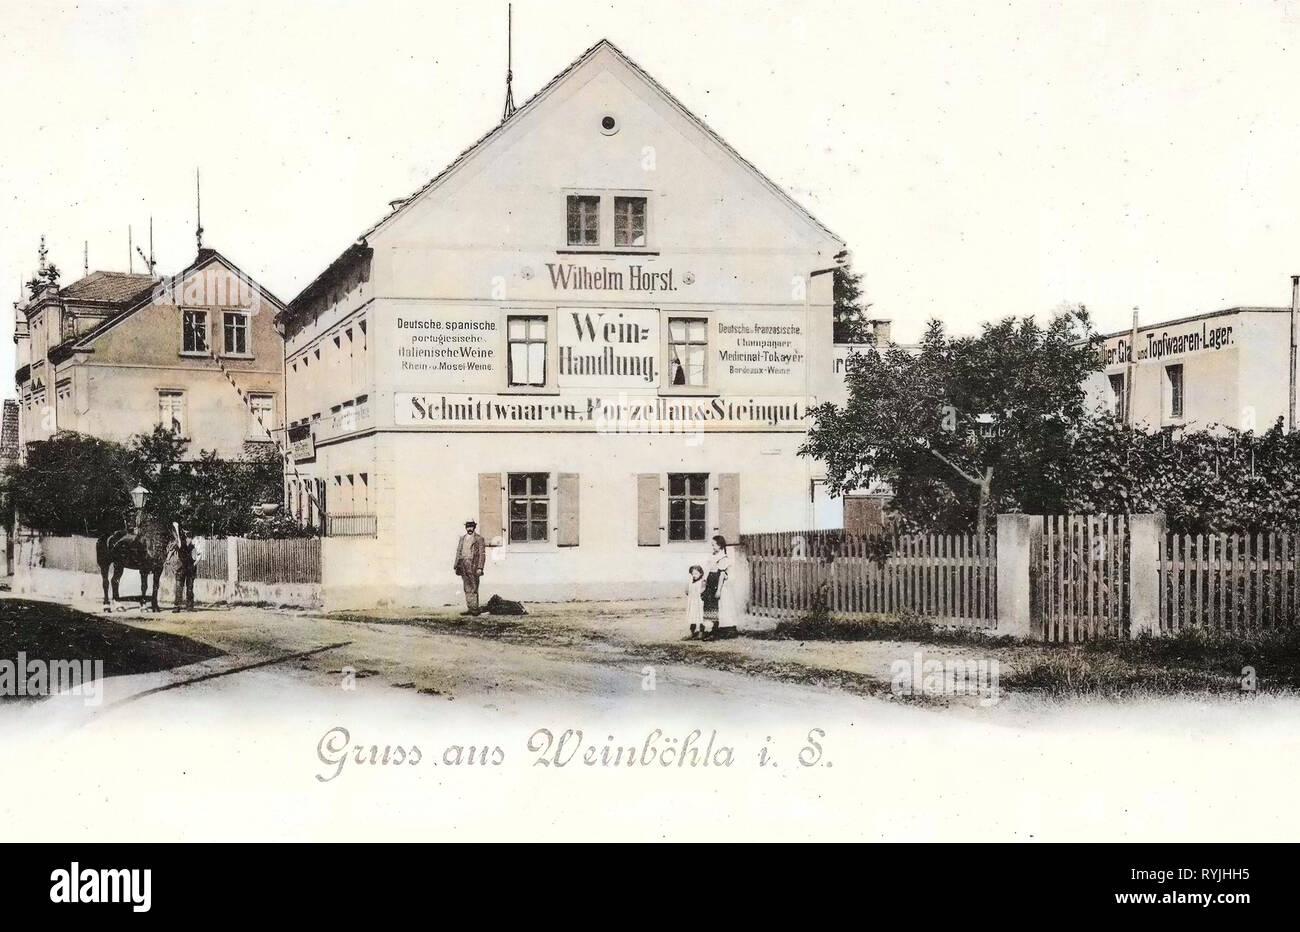 Wine trade, Horses of Landkreis Meißen, Buildings in Landkreis Meißen, Weinböhla, 1898, Landkreis Meißen, Weinhandlung Horst, Germany Stock Photo